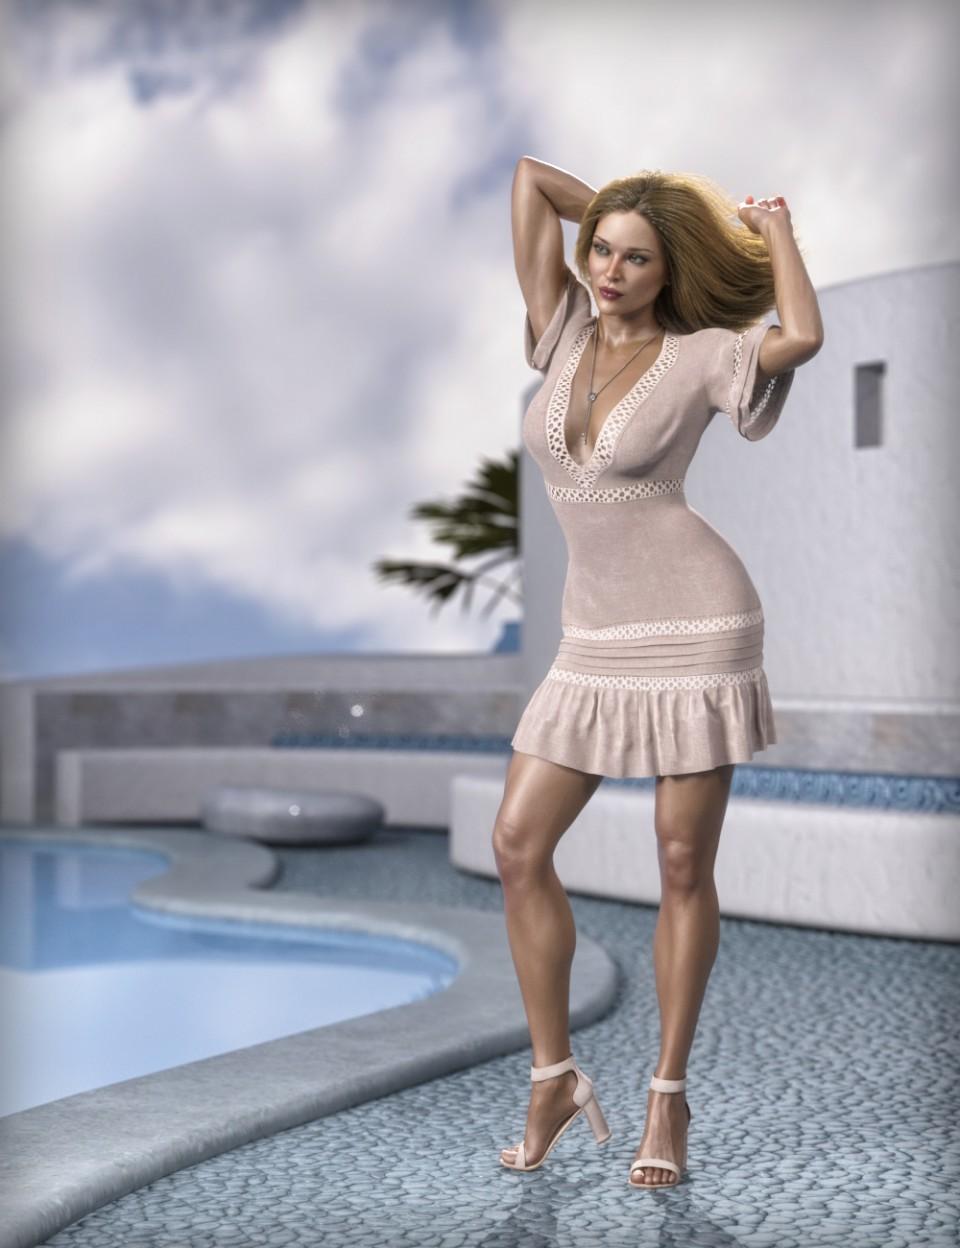 dforce-mdsd-rhodes-summer-set-outfit-for-genesis-8-female(s)